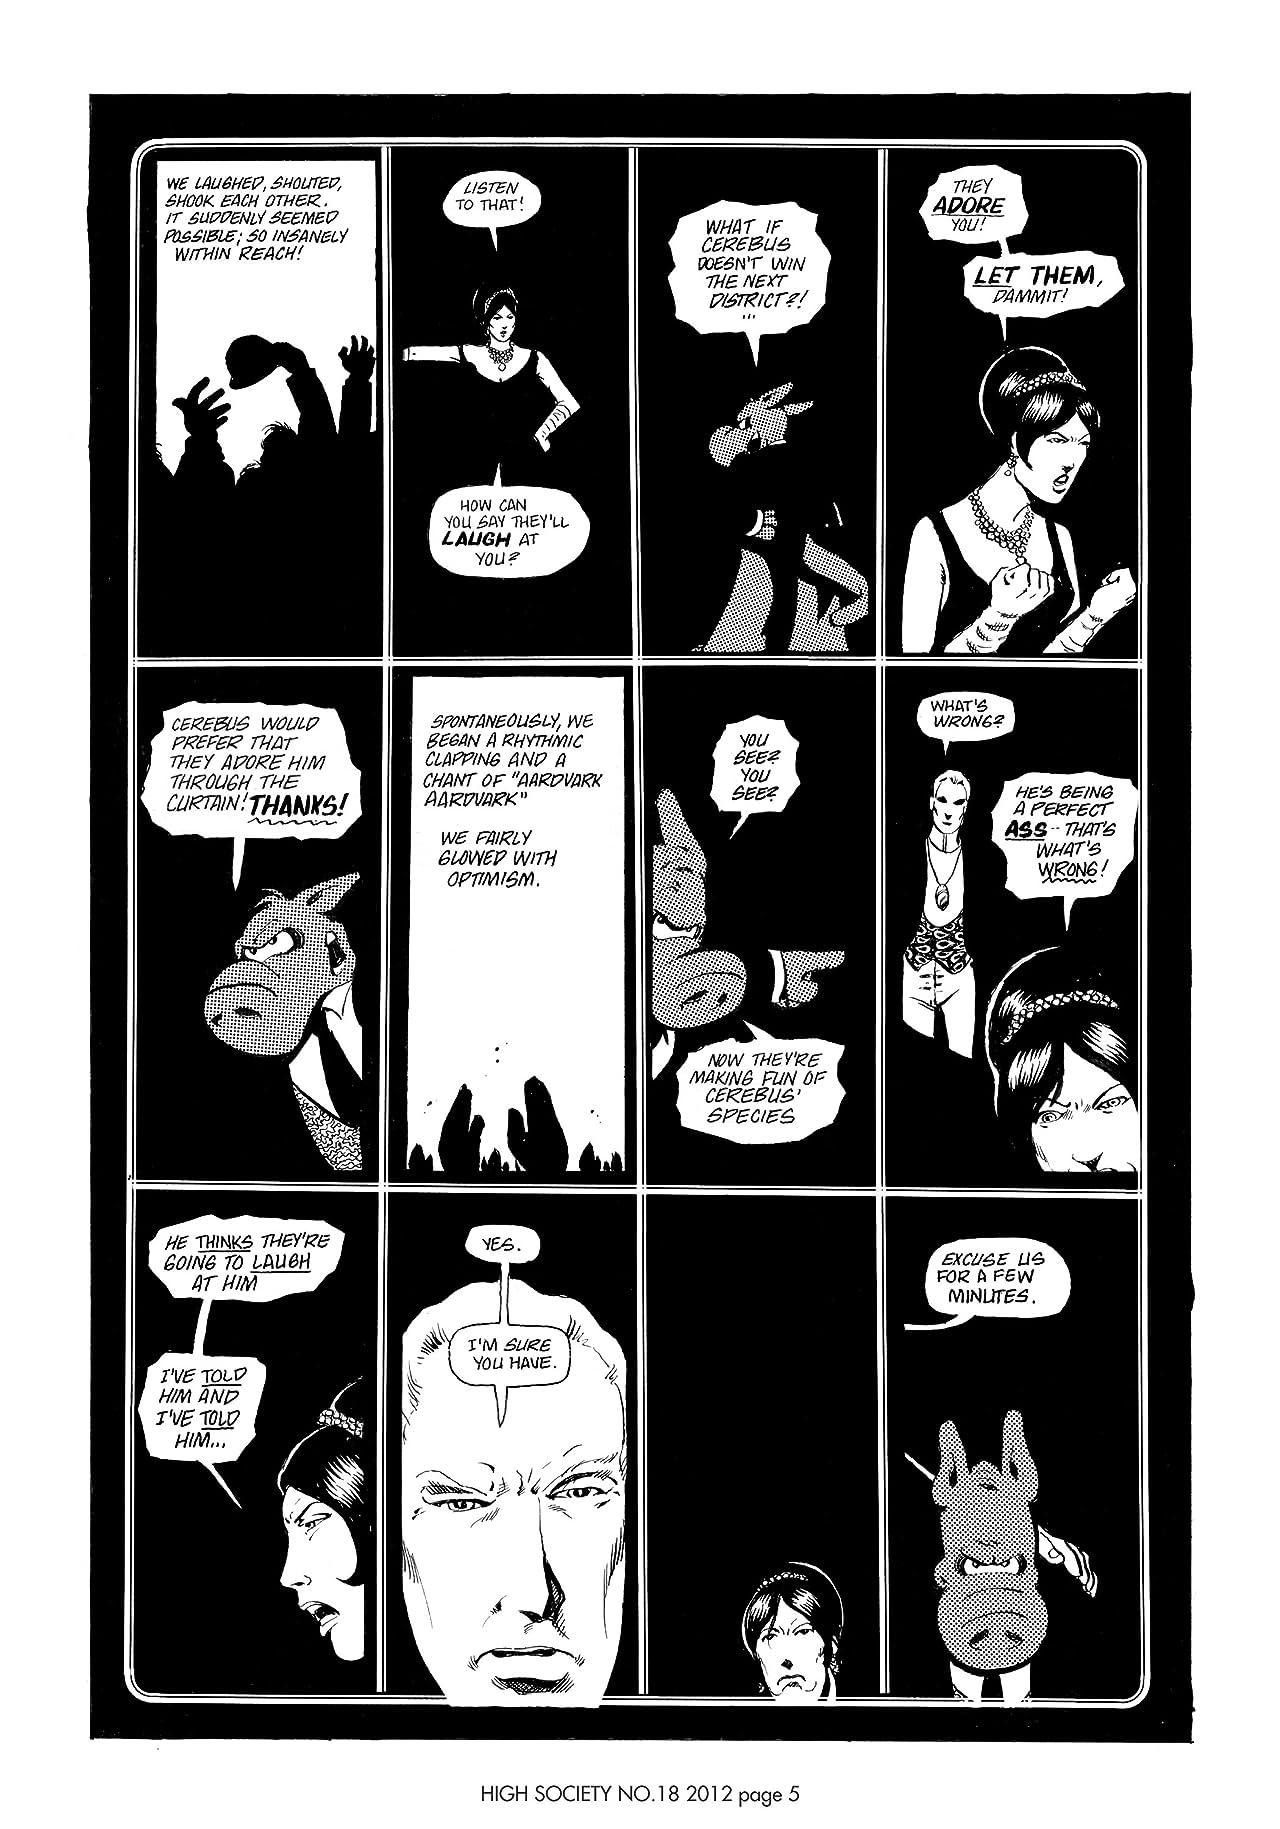 Cerebus Vol. 2 #18: High Society